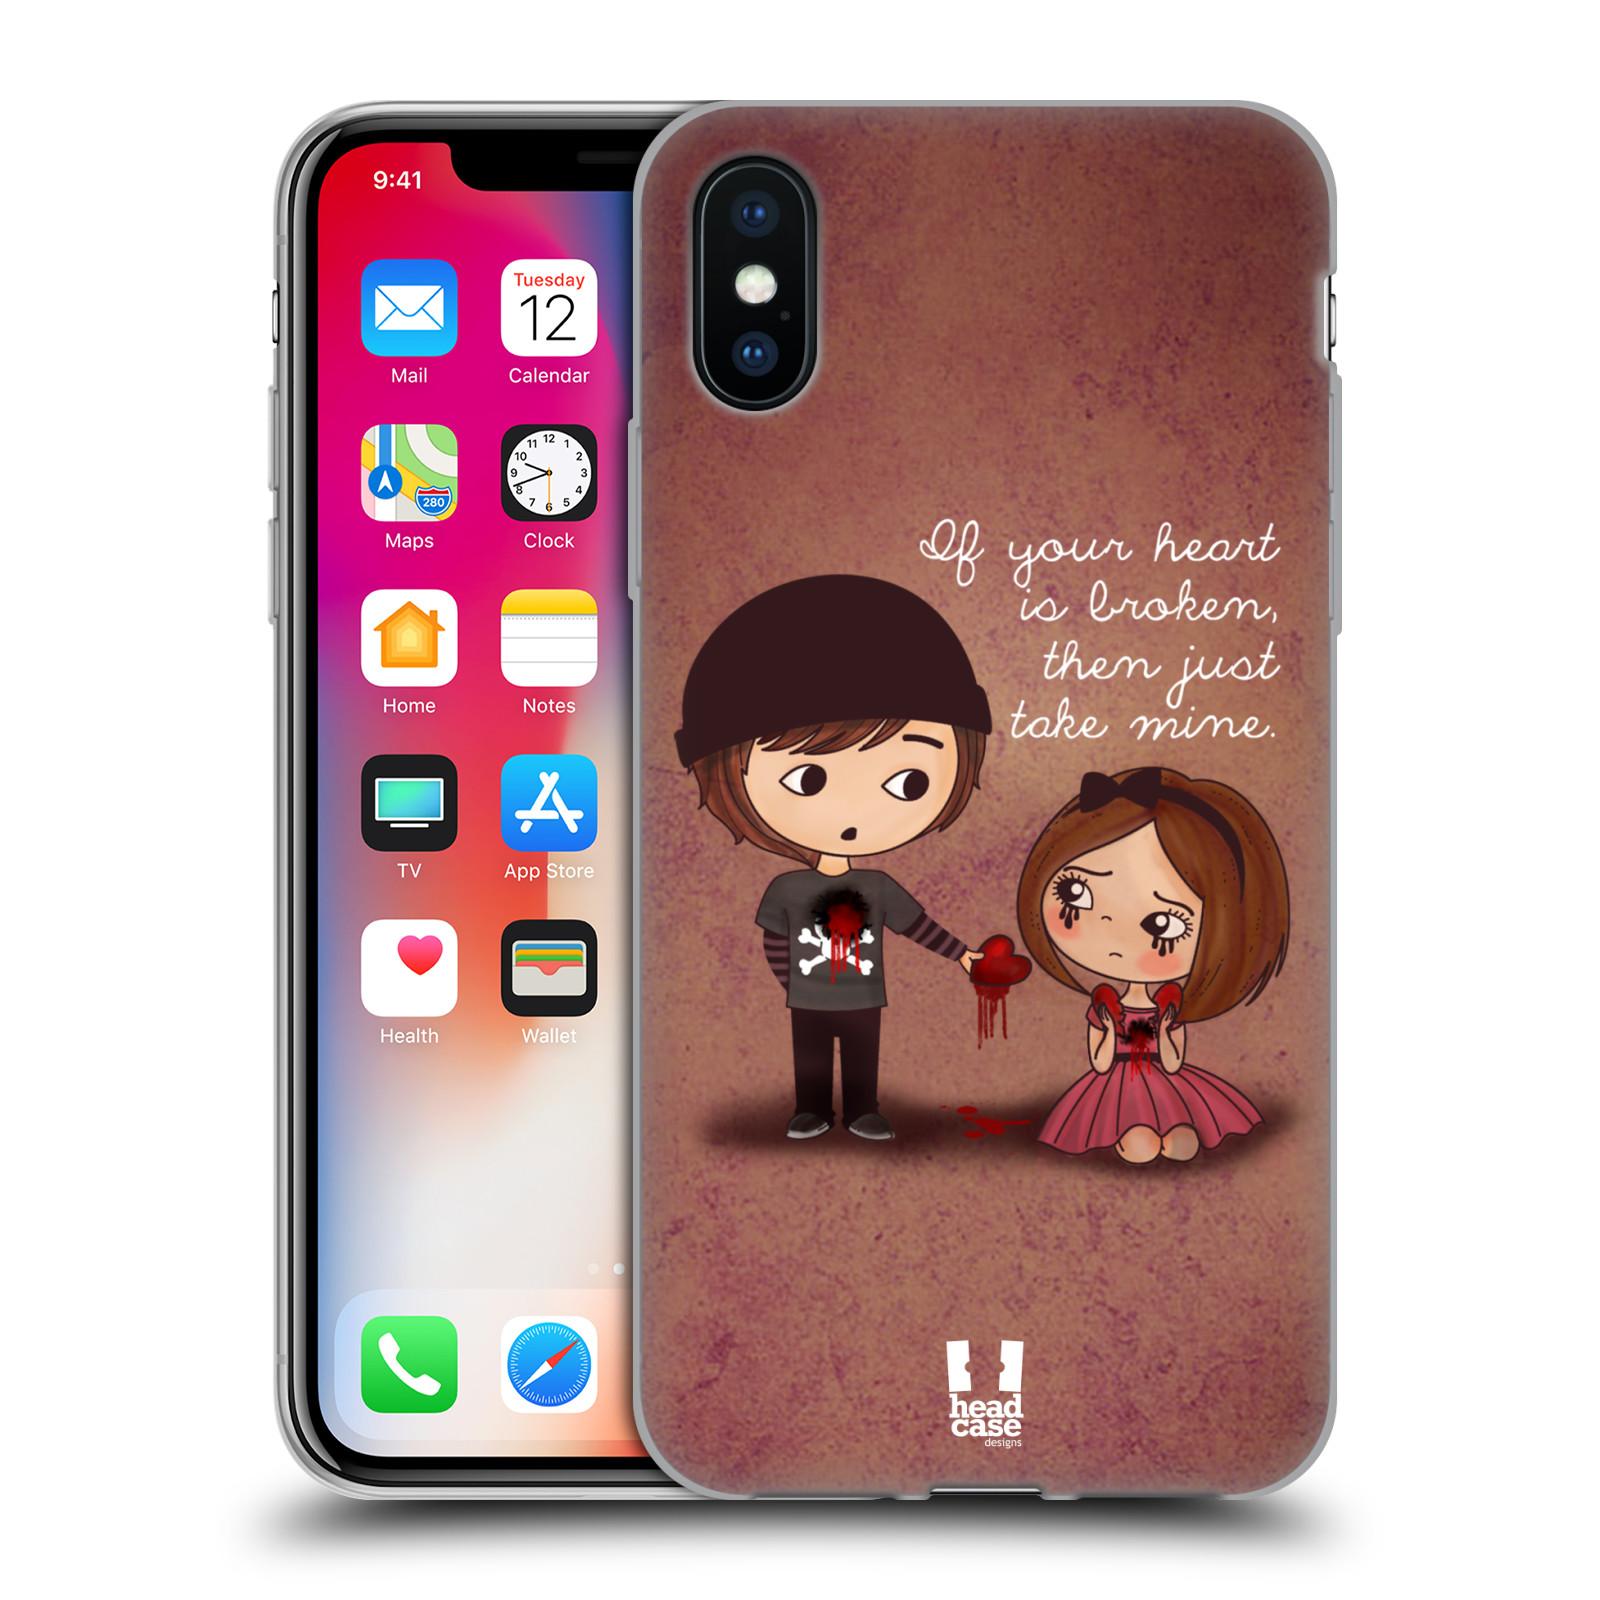 Silikonové pouzdro na mobil Apple iPhone XS - Head Case - Emo Love Srdce